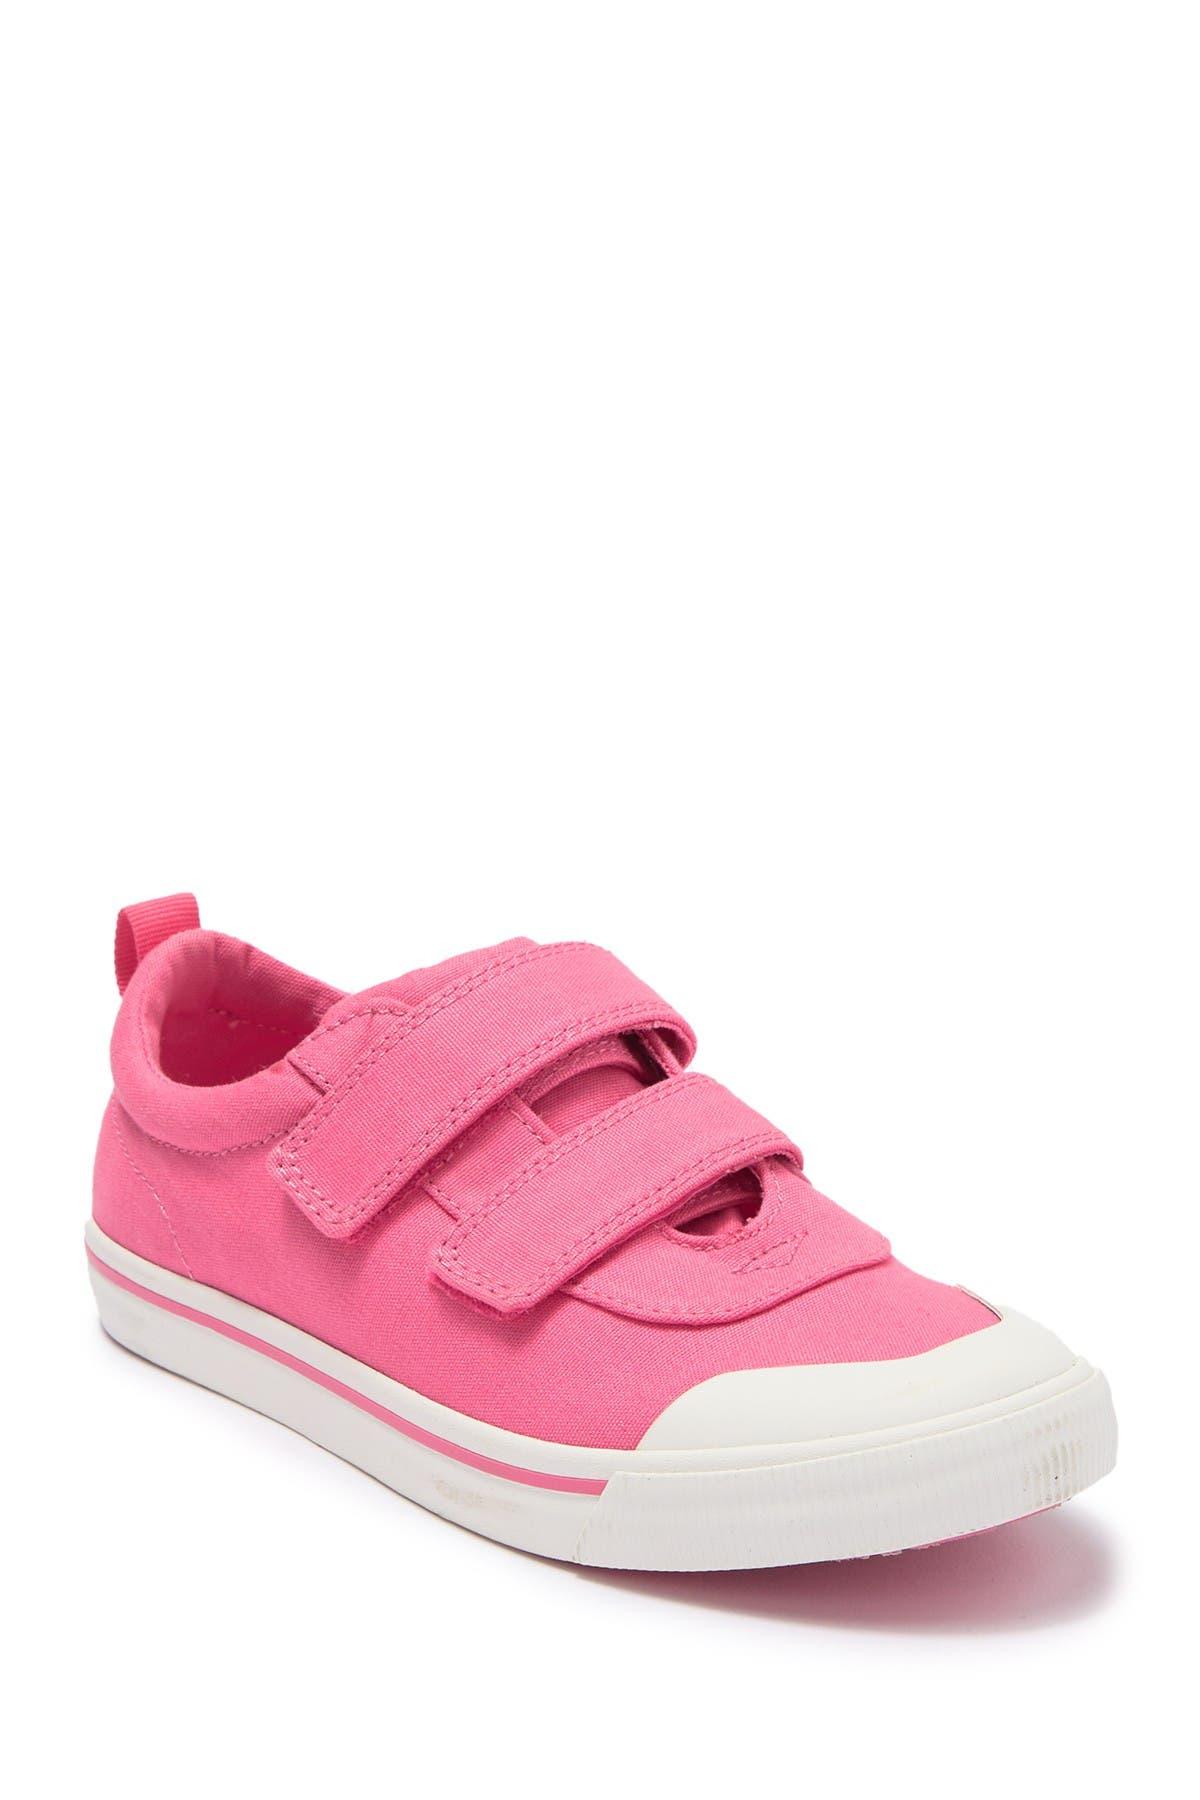 TOMS Dohney Sneaker